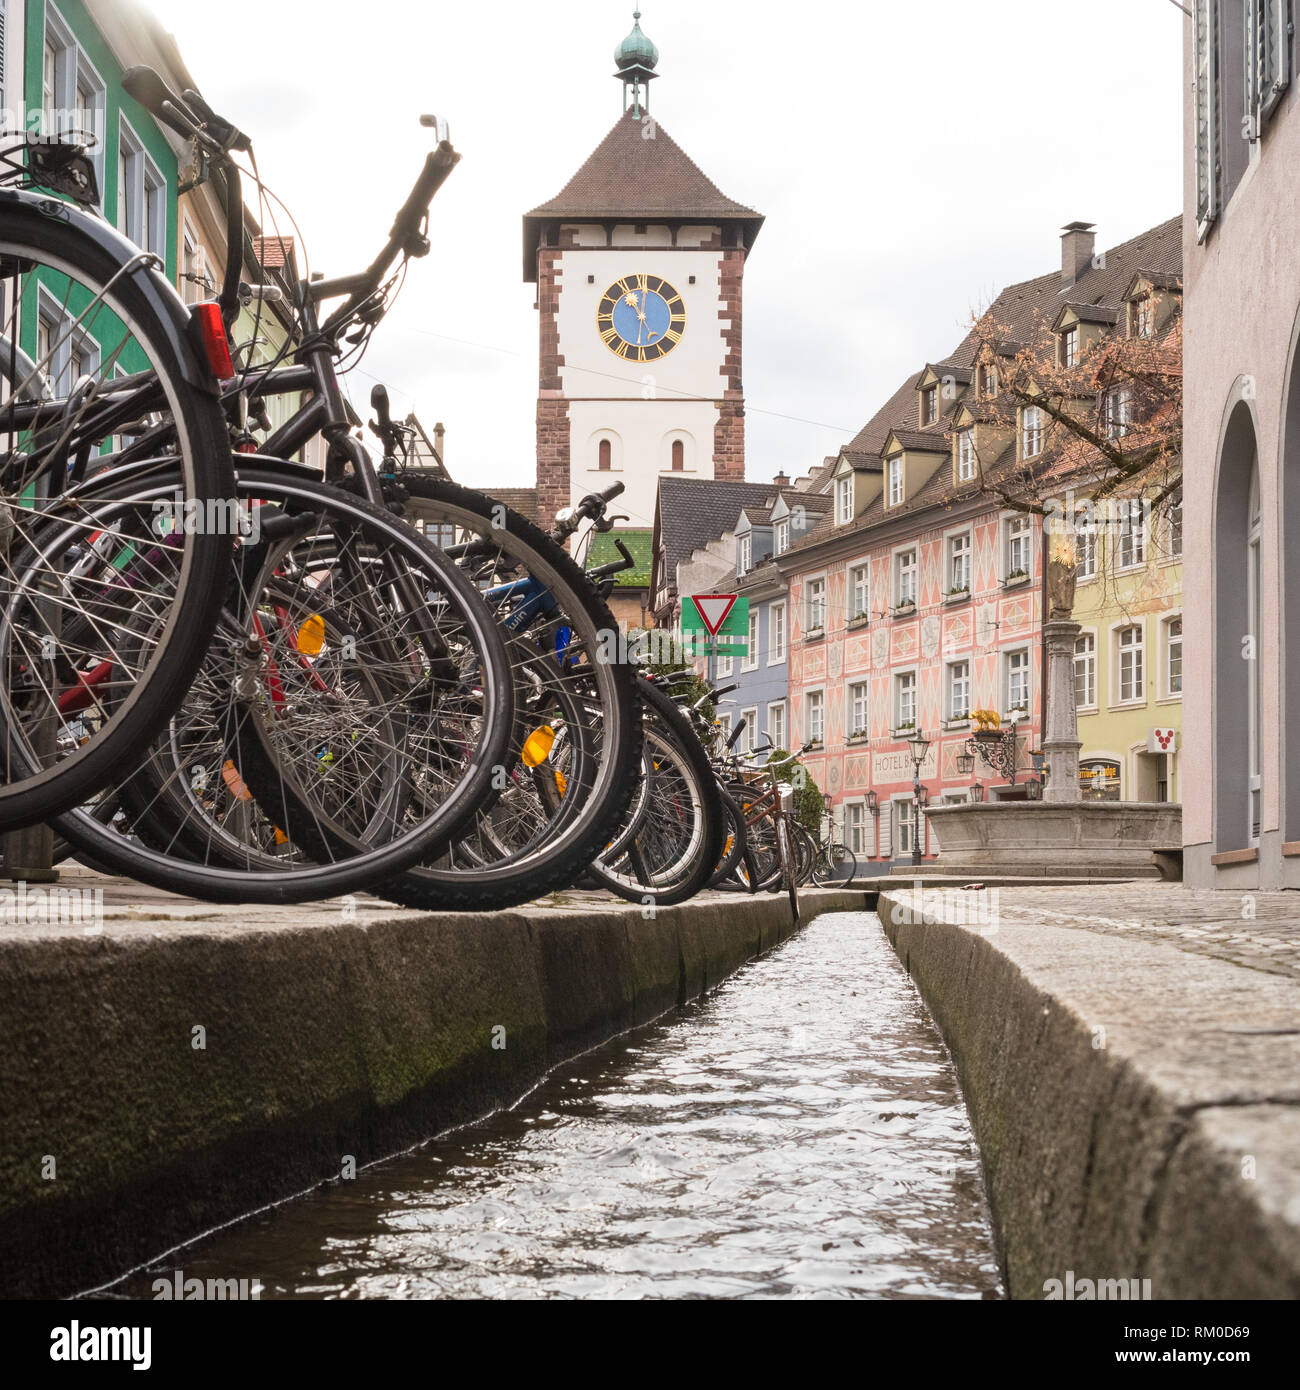 Freiburg im Breisgau, Baden Wurttemberg, Germany - Stock Image